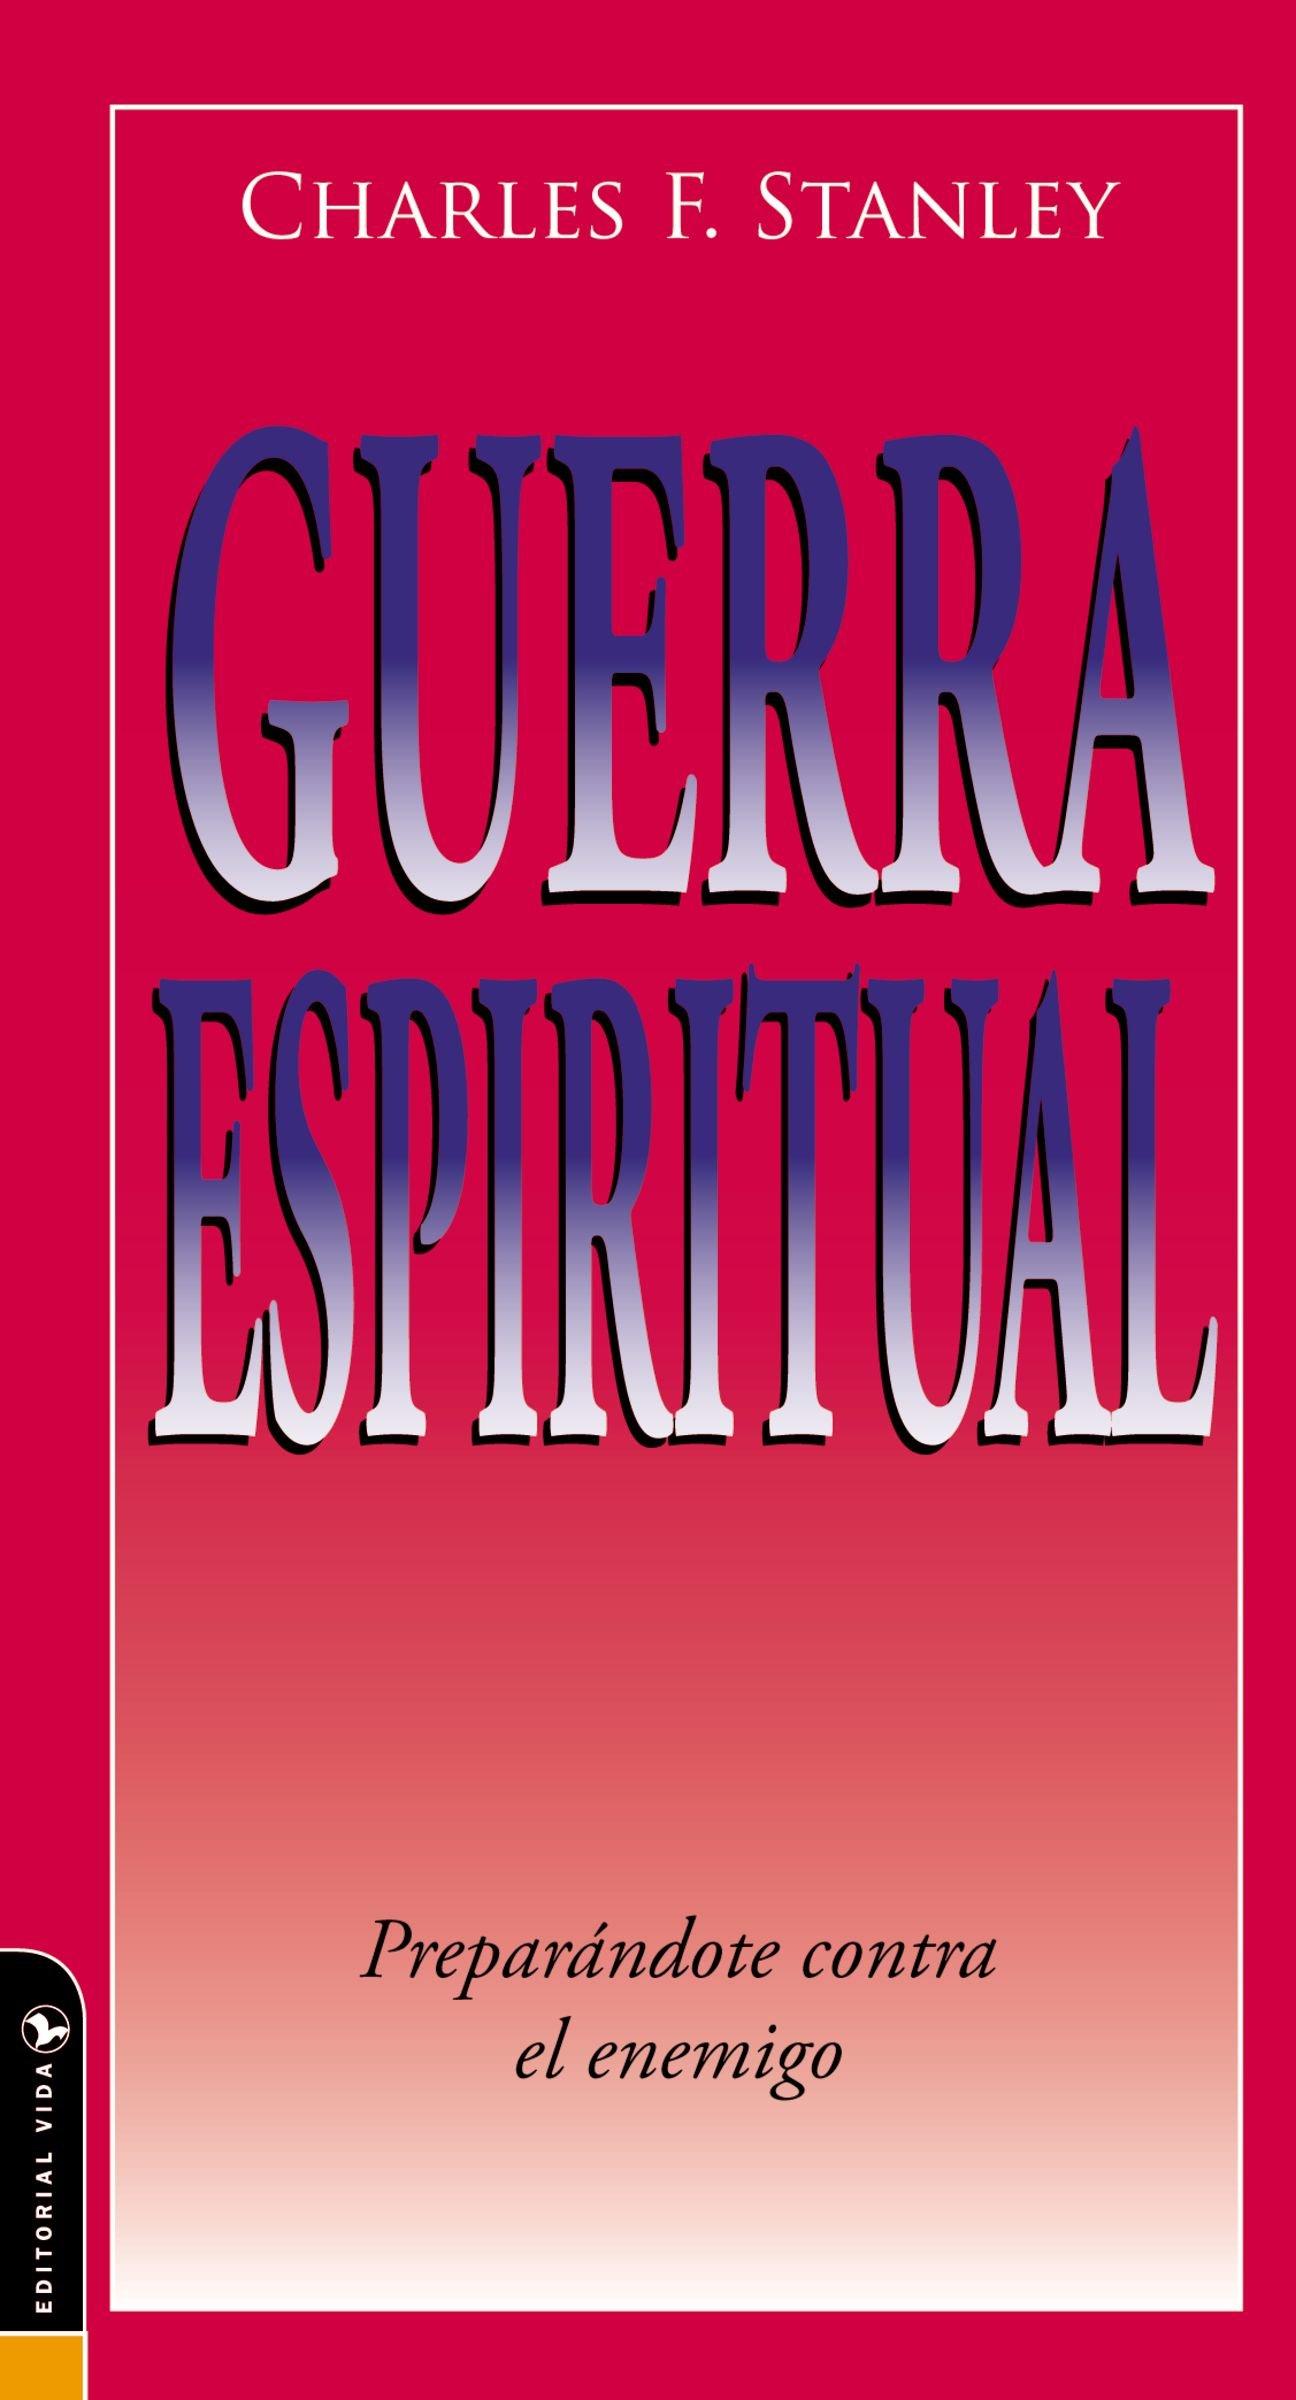 Guerra Espiritual: Preparándote contra el enemigo (Guided Growth Booklets Spanish) (Spanish Edition) by HarperCollins Christian Pub.